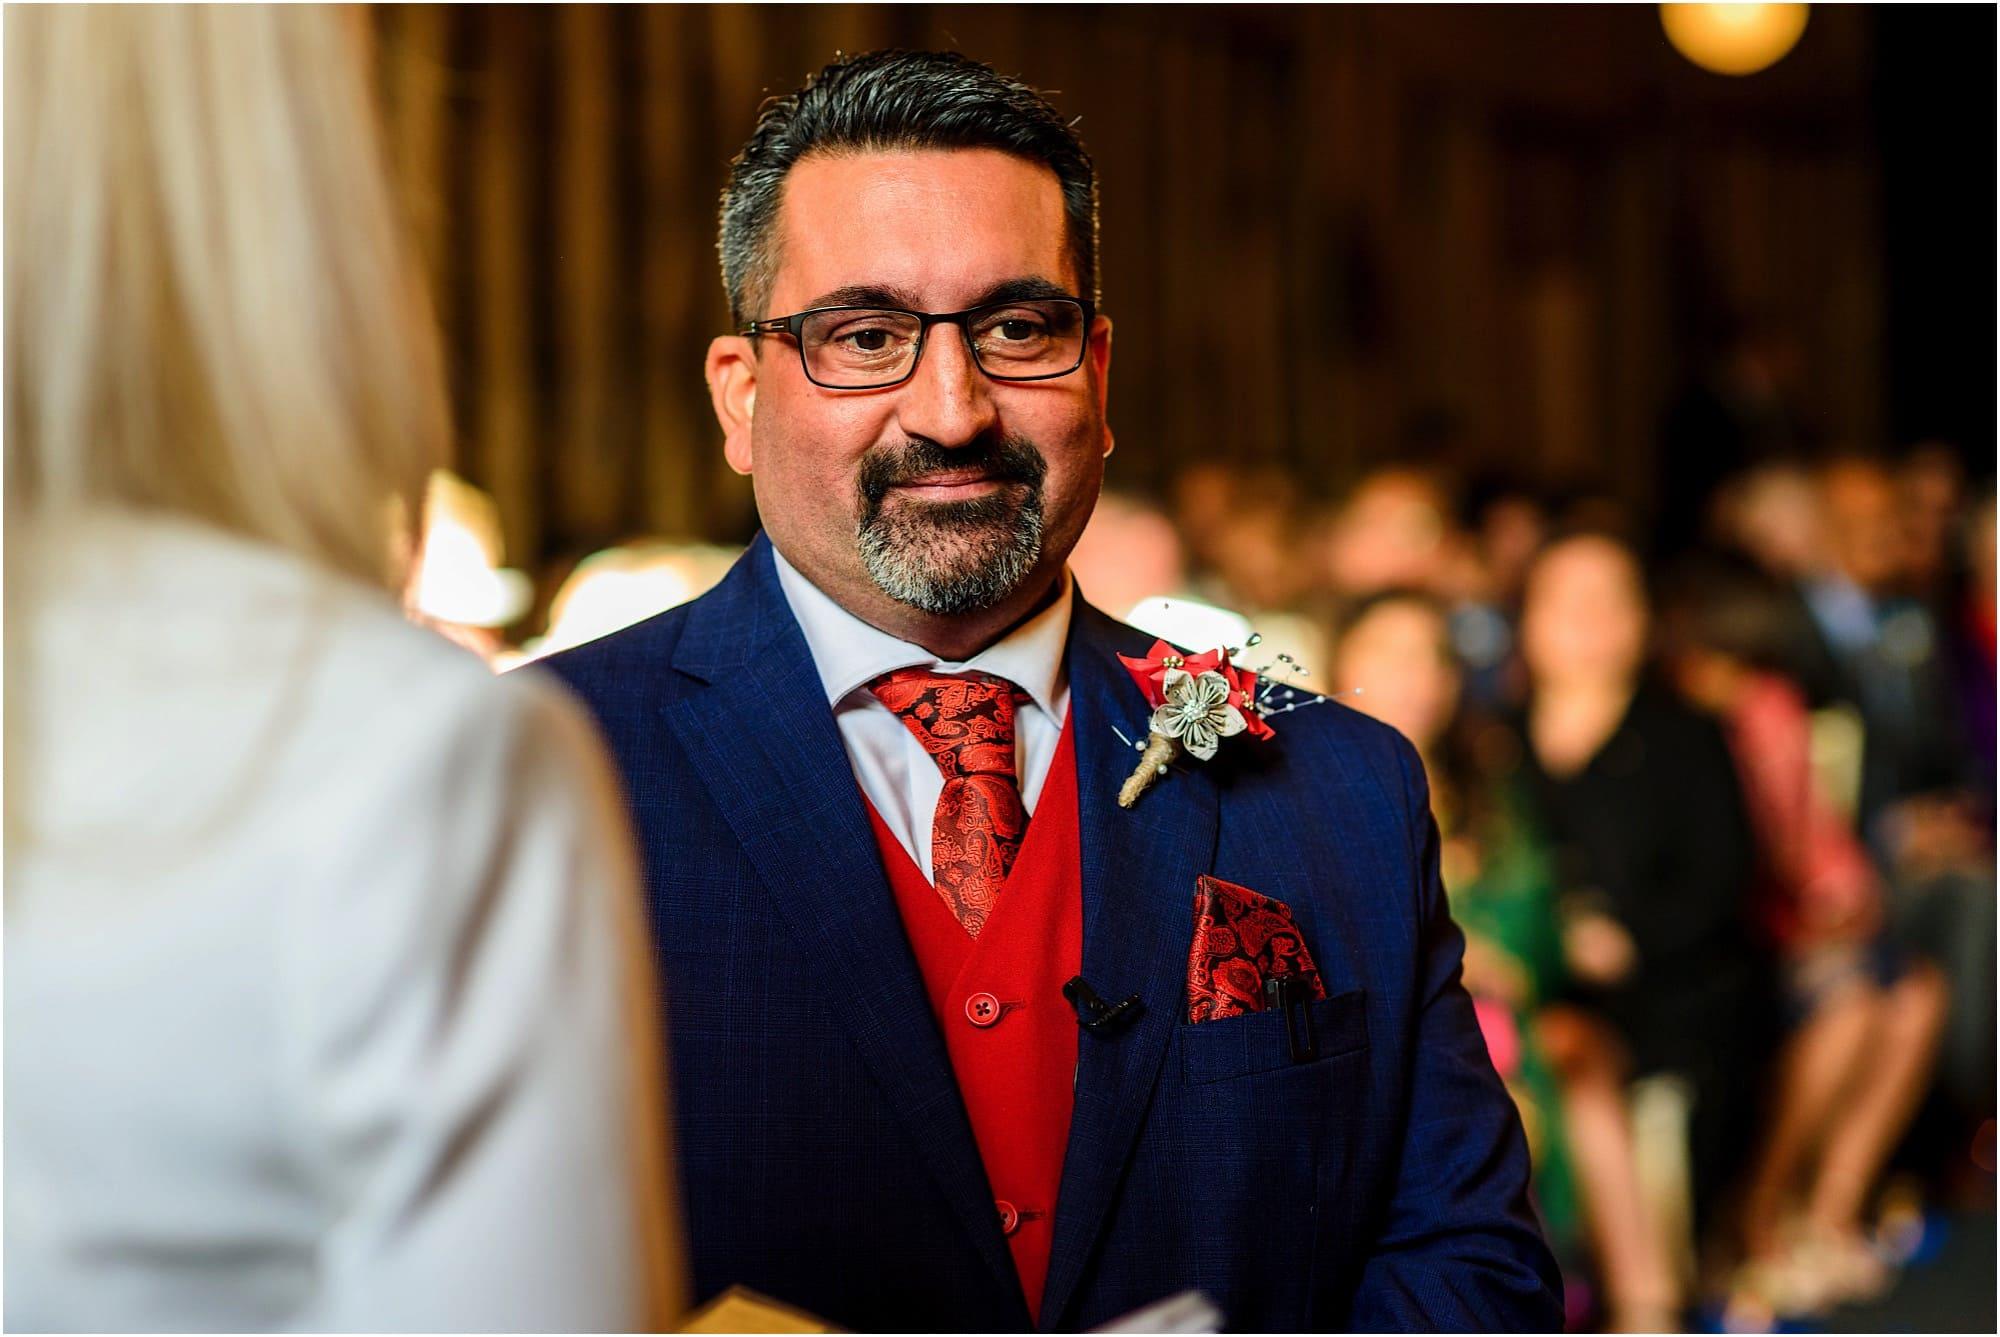 Anxious groom